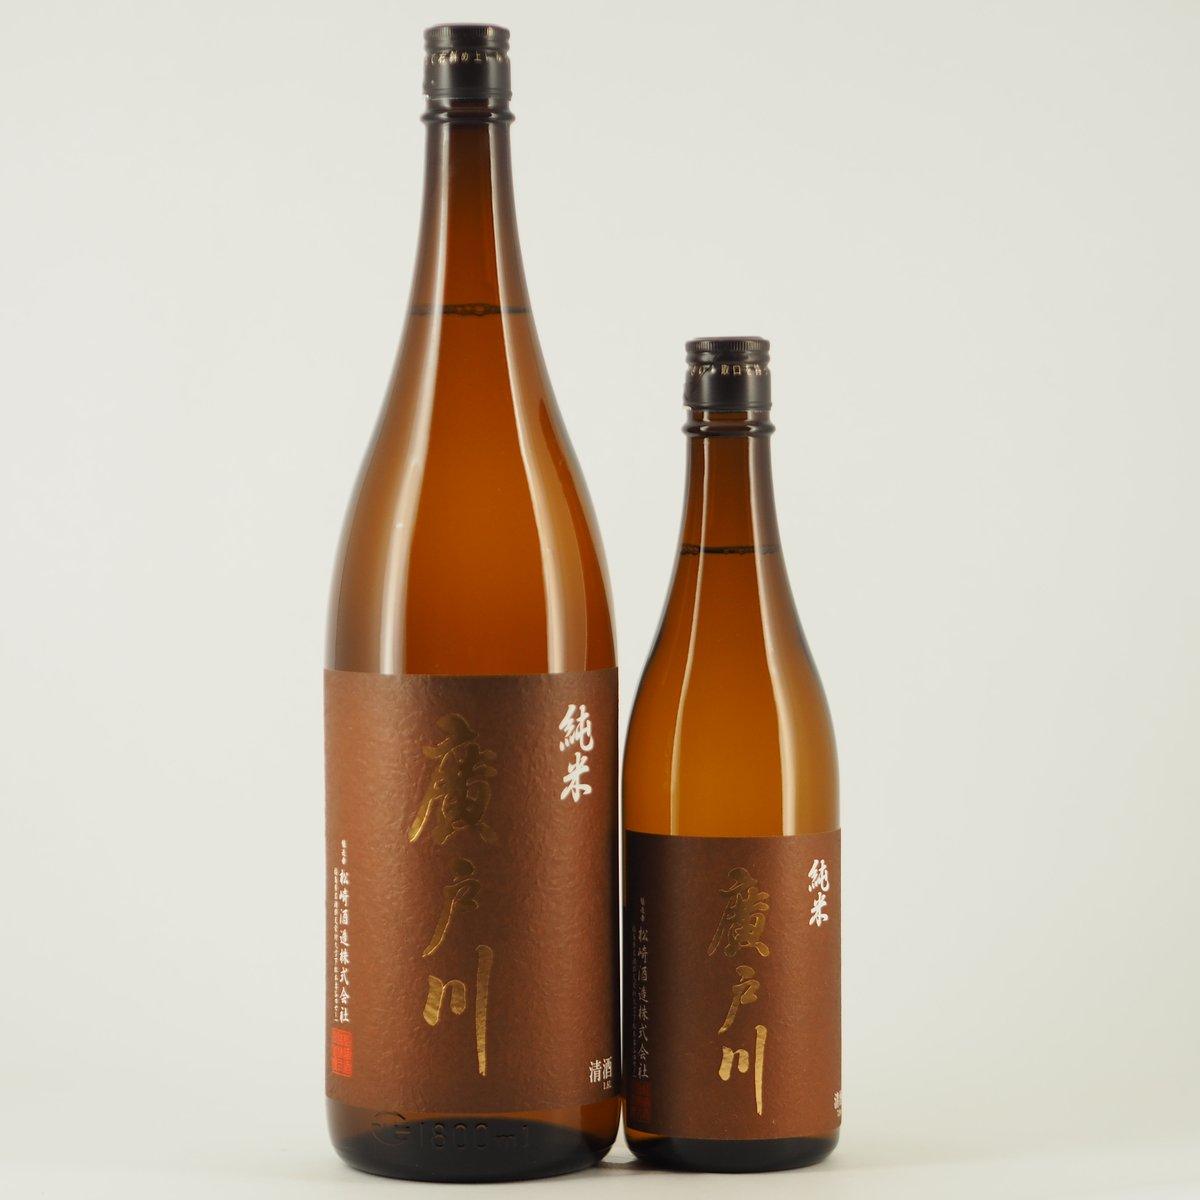 test ツイッターメディア - 【日本酒】  廣戸川 純米 秋あがり 入荷しました!  ※明日9/20(日)より店頭販売開始です。  素朴でありながら、 軸のしっかりとしたお米の旨味。 食事に合わせてゆっくりお楽しみ下さい。  詳しくはブログで! https://t.co/uaMgEUXgIX  オンラインショップはこちら https://t.co/LYz8plSGAH https://t.co/vUtm1K23AN